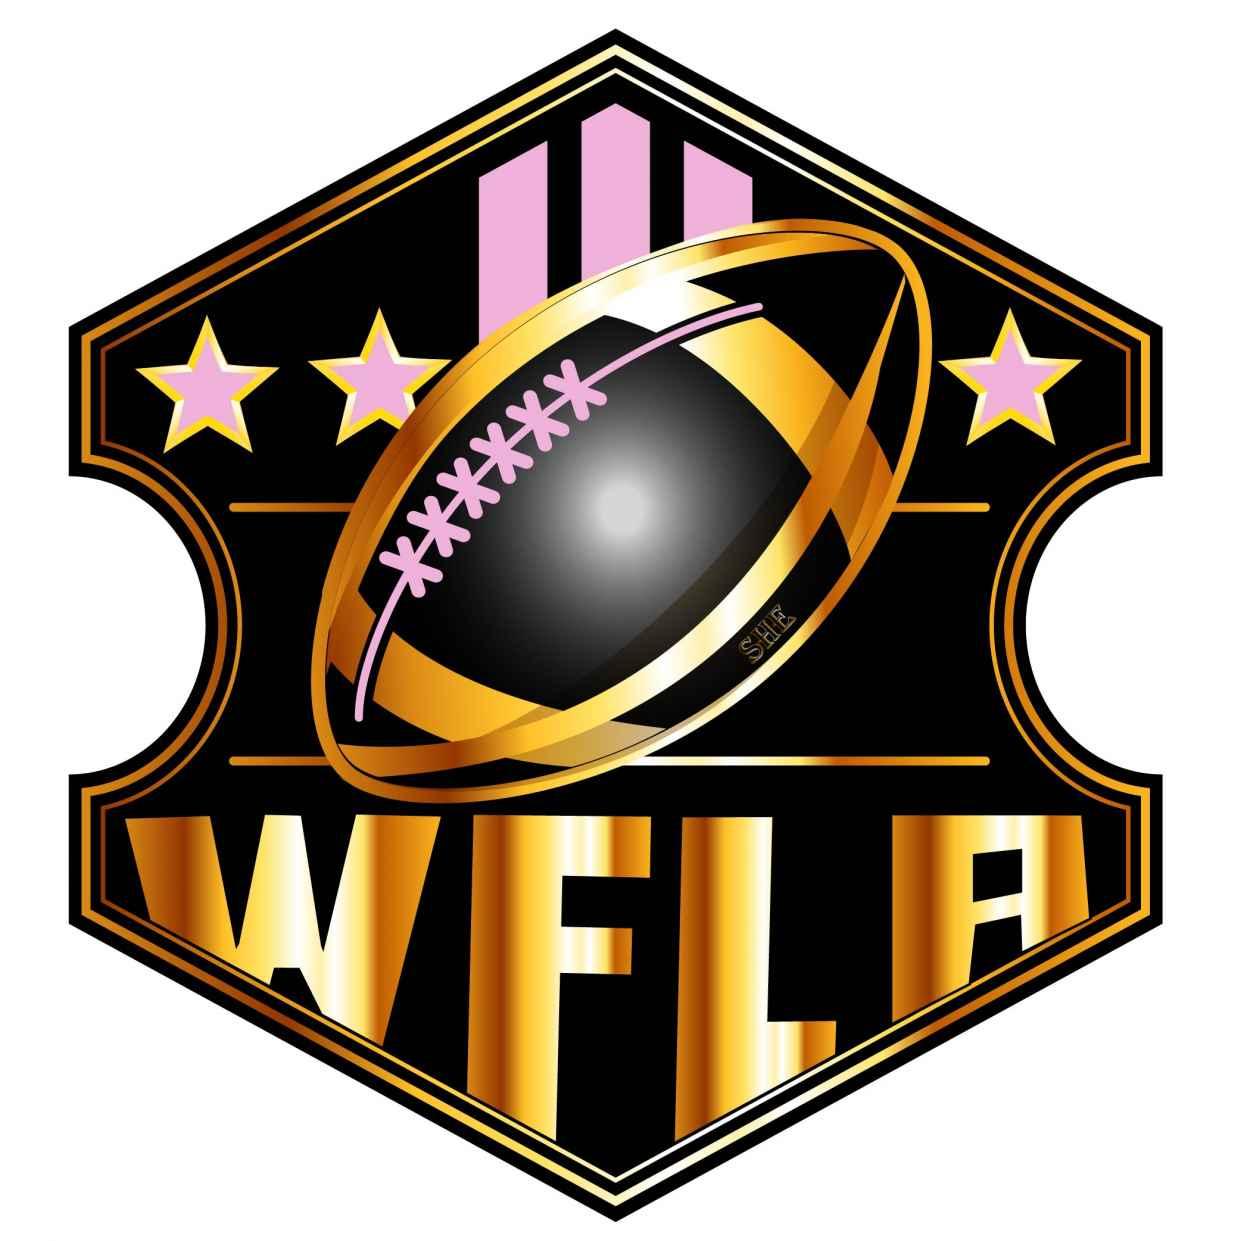 WFLA Shield